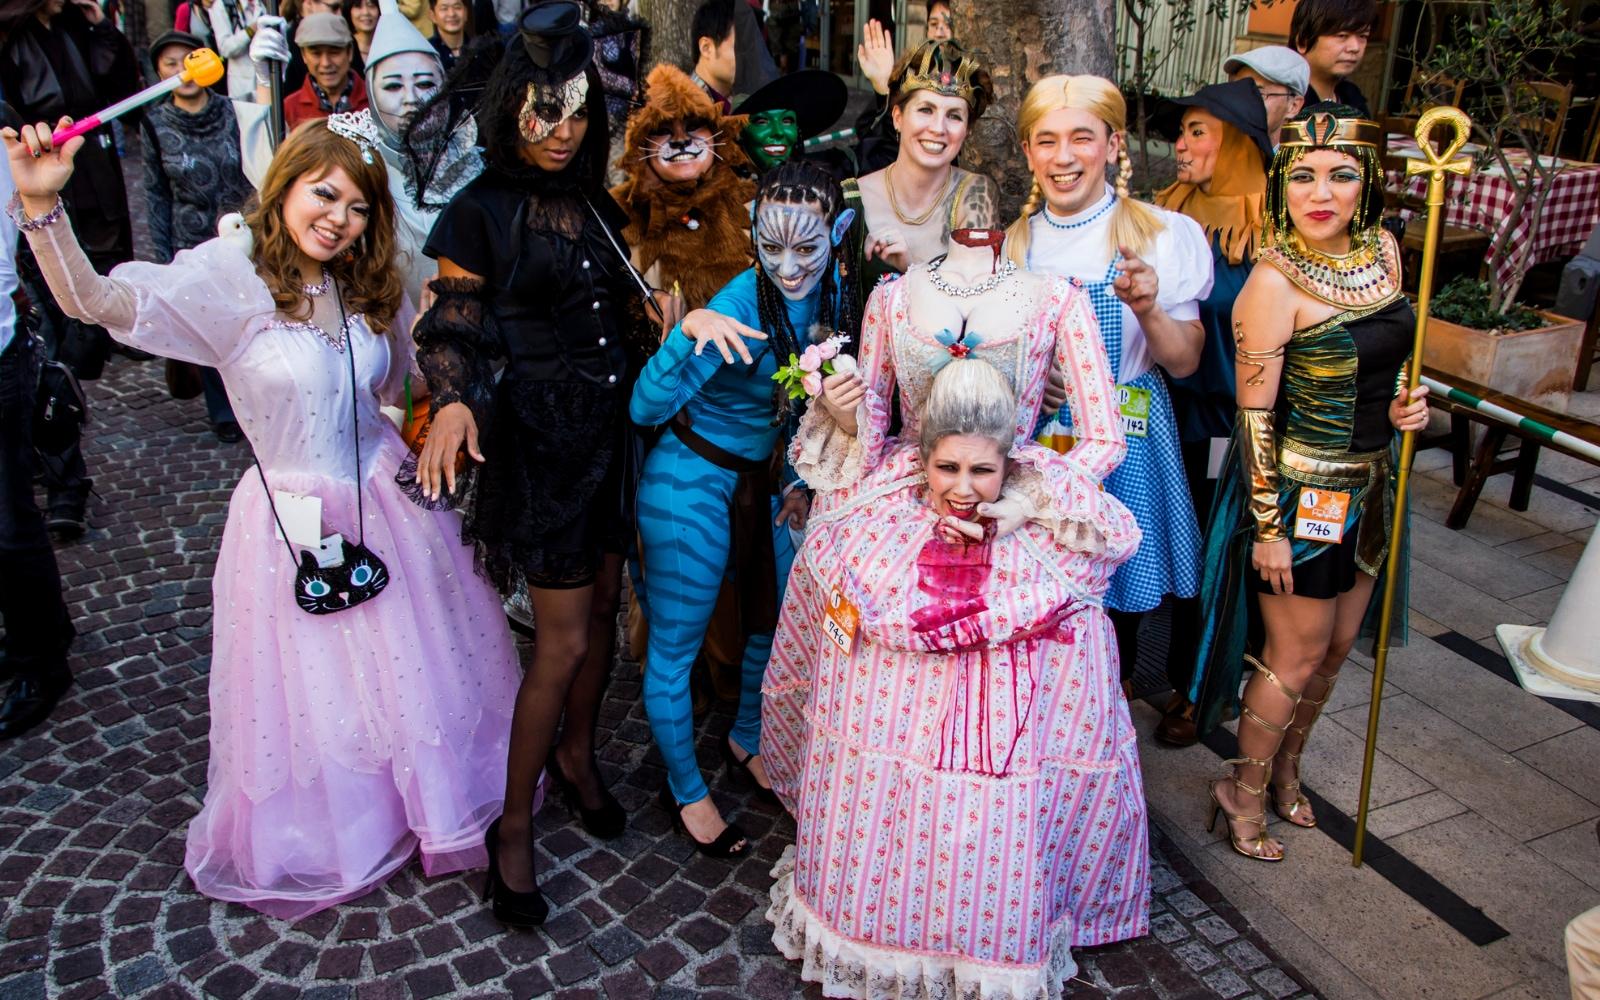 Beginilah Keseruan Perayaan Helloween Di Jepang Beserta Kostum-Kostumnya Yang Imut